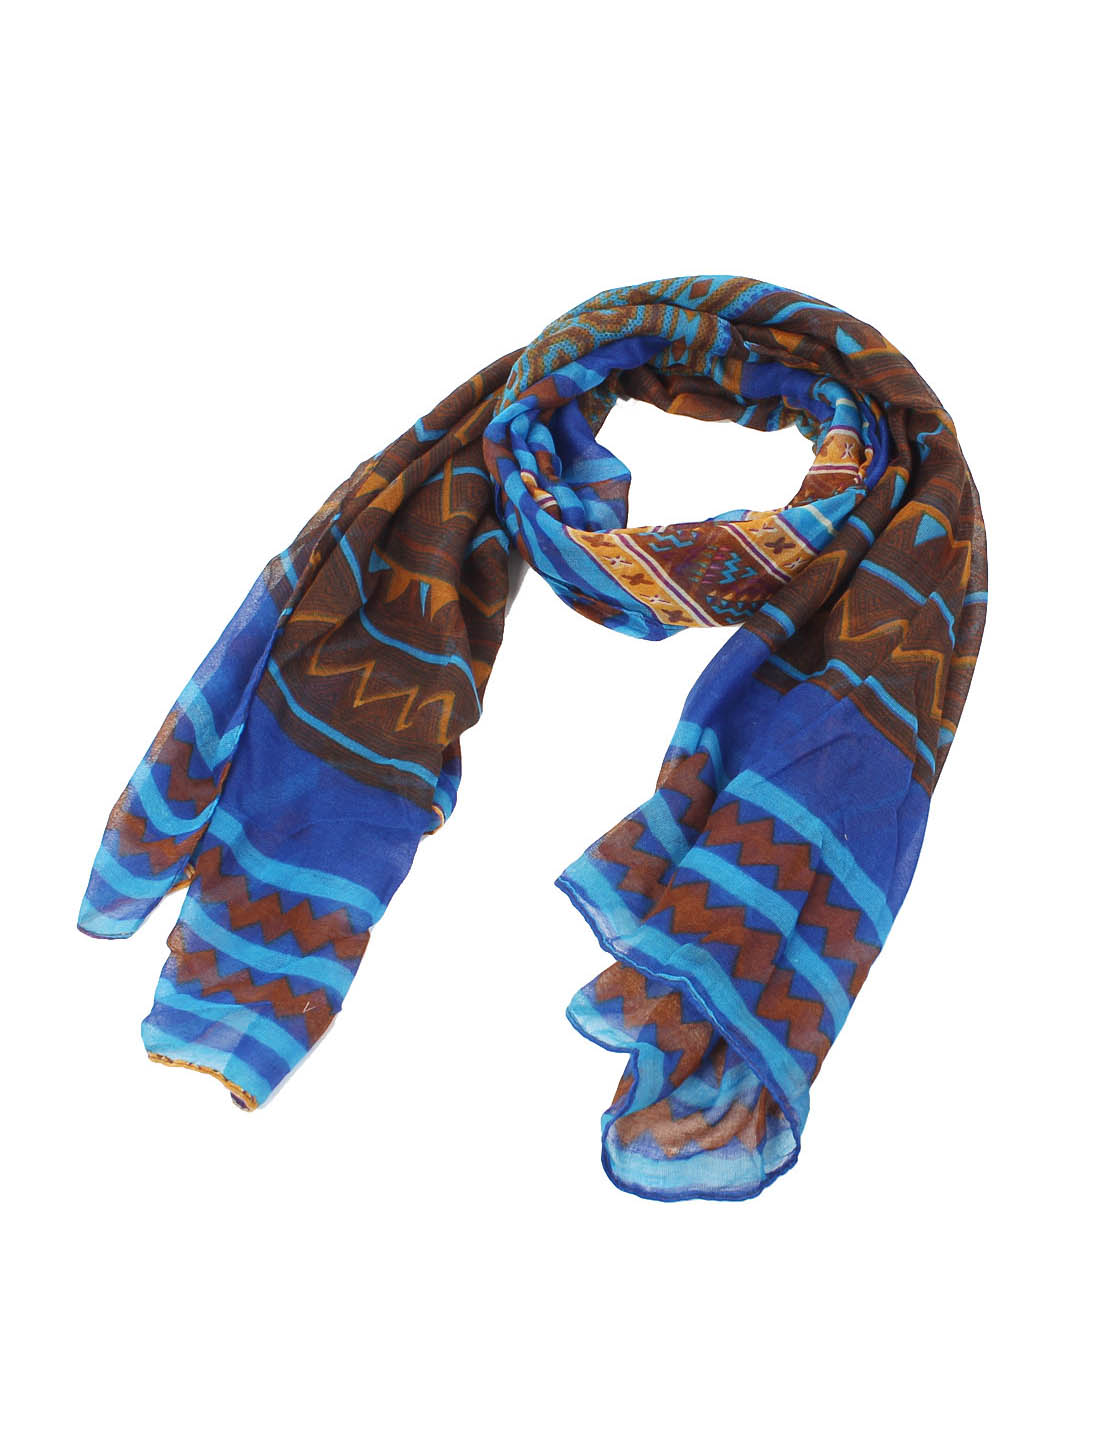 Women Lady Fashion Soft Fabric National Style Long Scarf Shawl Wrap Colorful